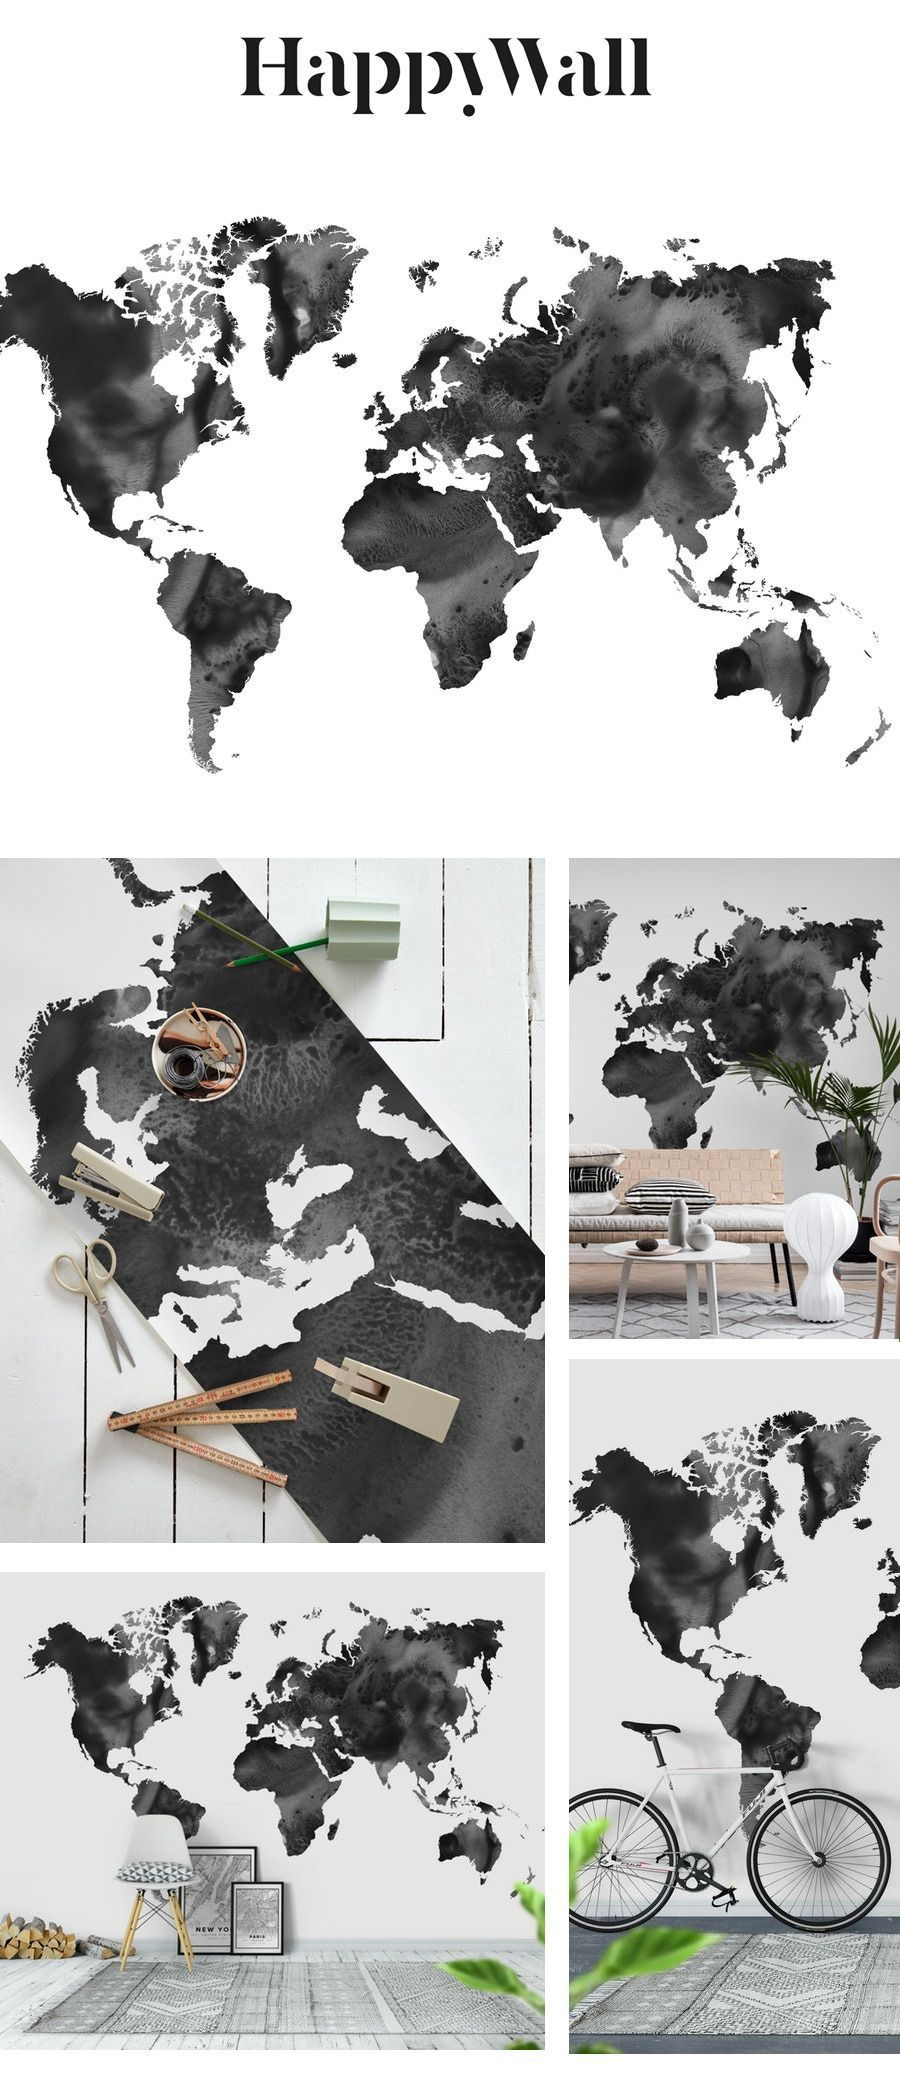 Watercolor World Map in Black Wall mural #worldmapmural Watercolor World Map in Black wall mural from Happywall #traveler #travelworldmap #worldmap #studio #painting #watercolours #wanderlust #wallmurals #wallmural #loft #modern #livingroom #lobby #adventurers #boysroom #teenagers #bedroom #nordic #maison #watercolor #white #happywall #contemporary #office #blackandwhite #hotel #wallpapers #interiors #scandinavian #modernliving #adventure #travelmap #wallpaper #worldmapmural Watercolor World Map #worldmapmural